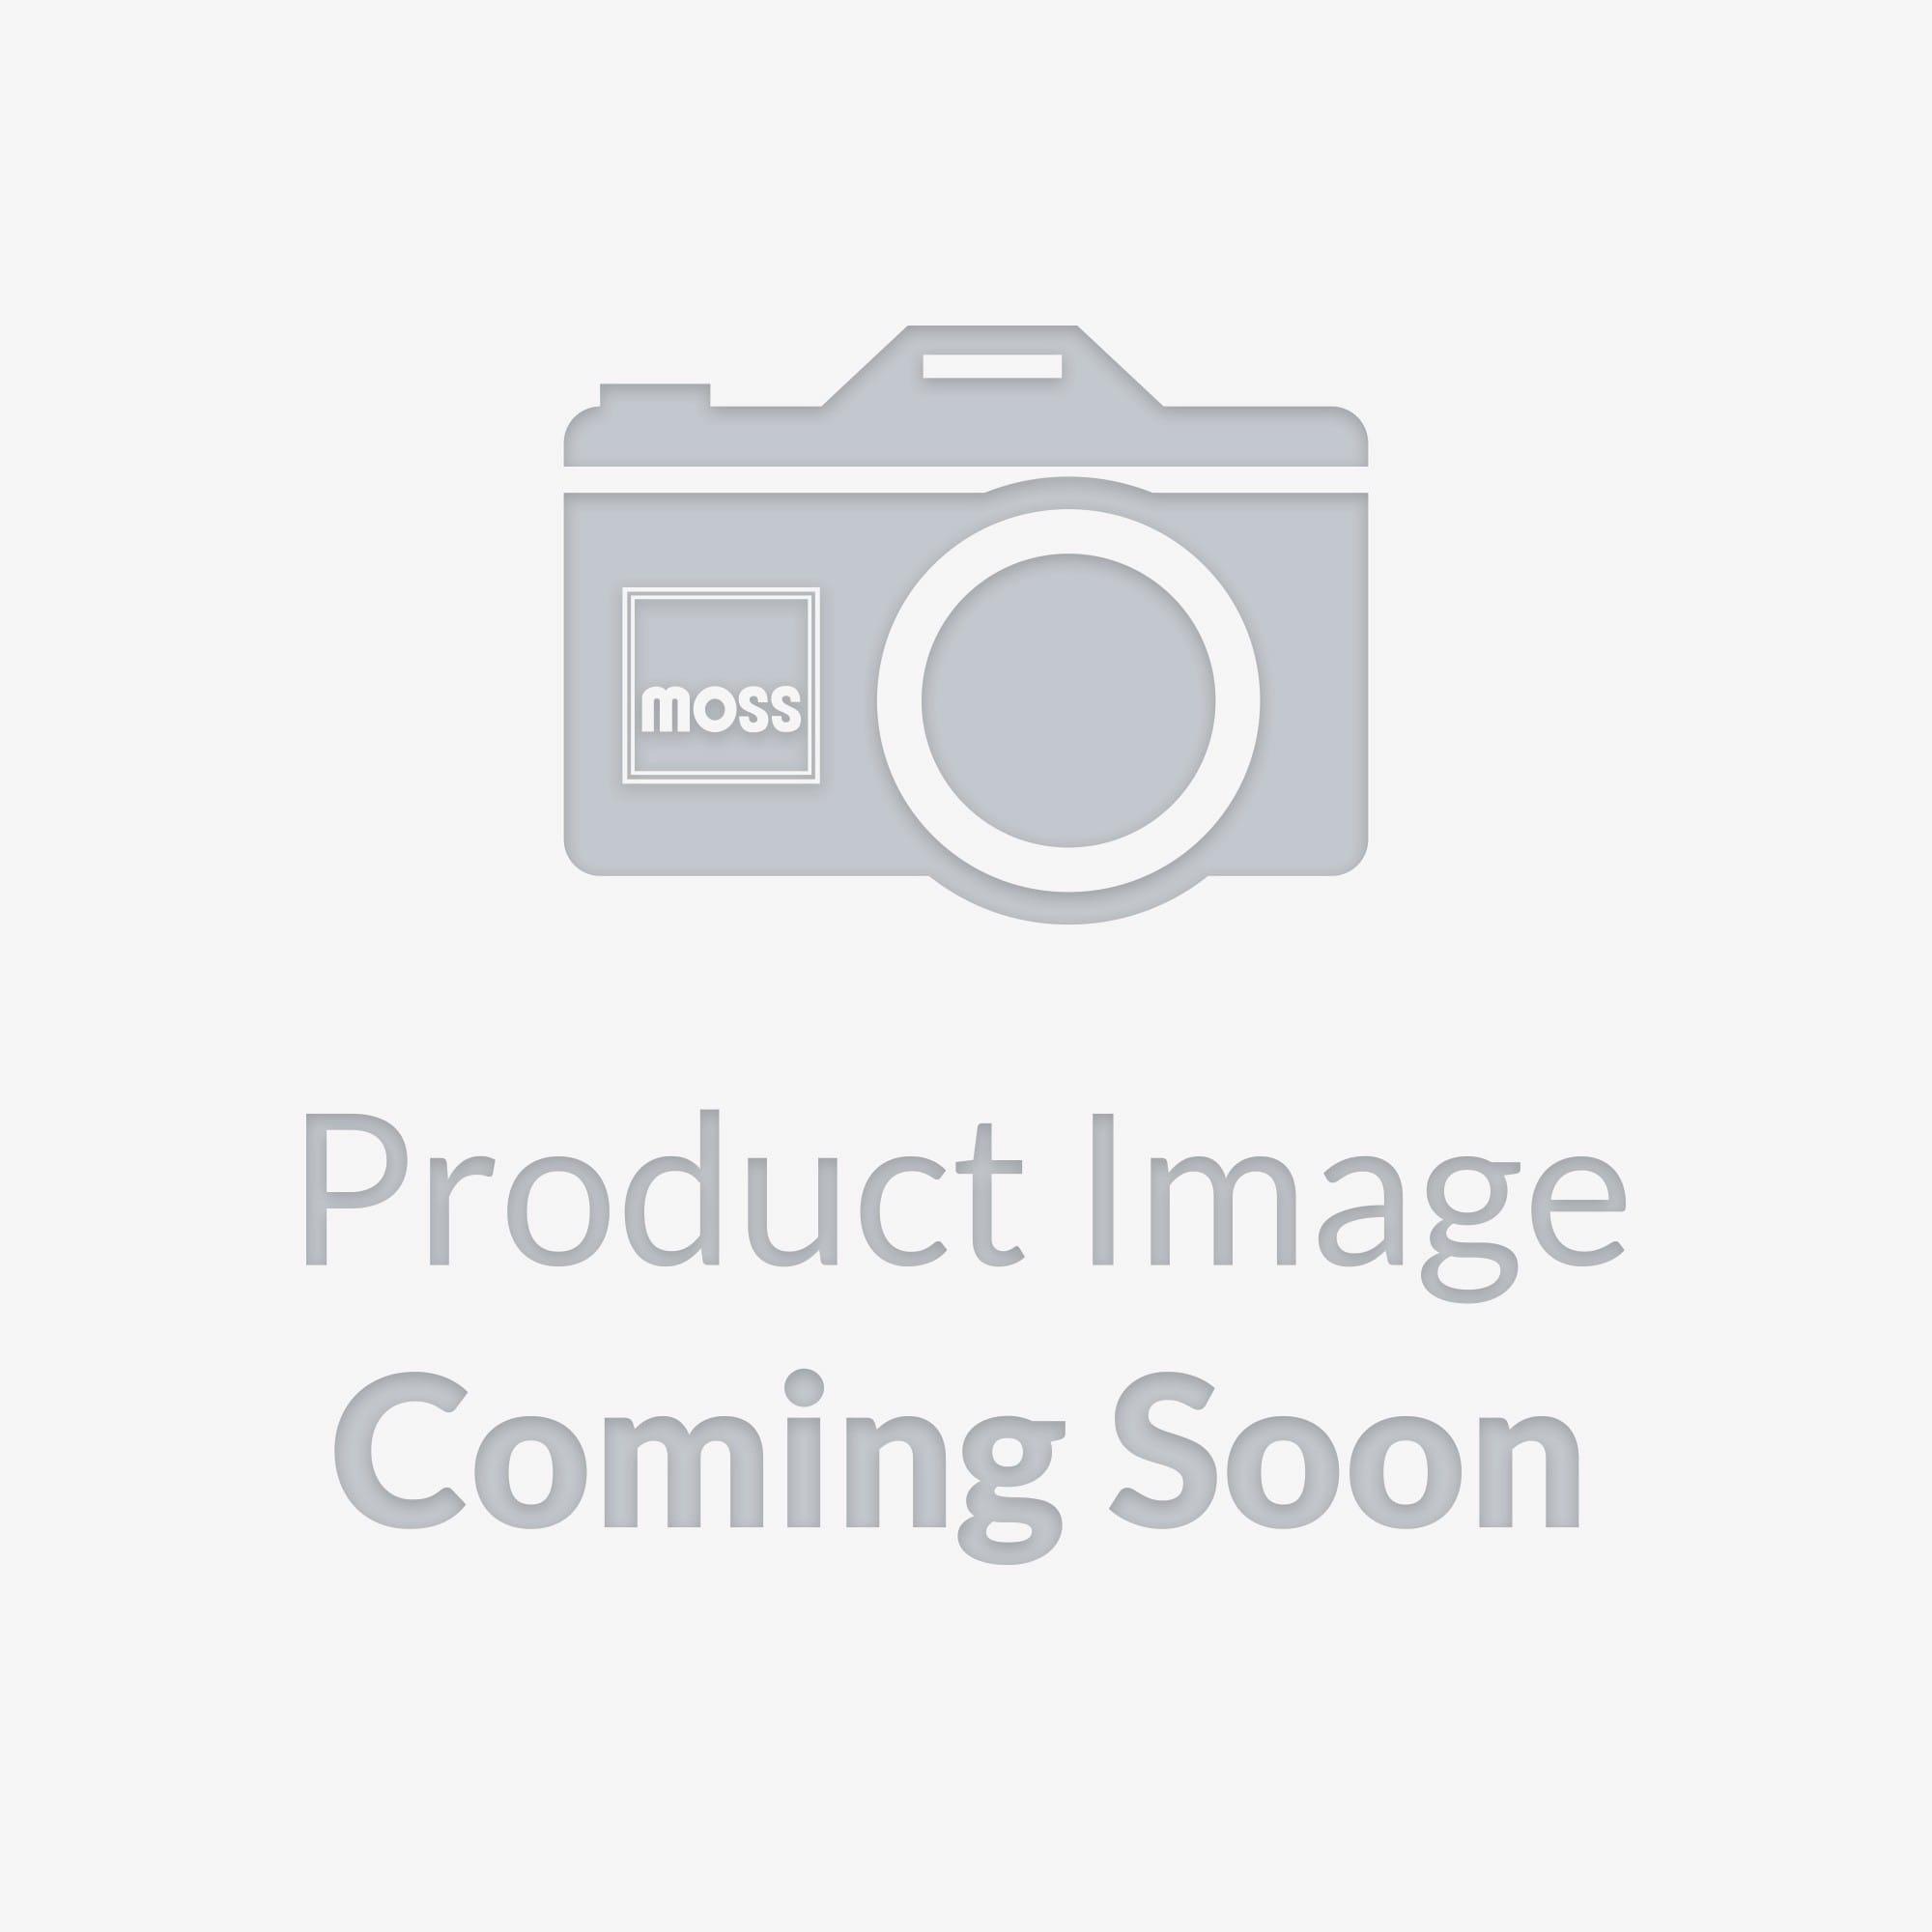 Tan Brand New! 1999-2005 Mazda Miata Convertible Top w//defrost glass window